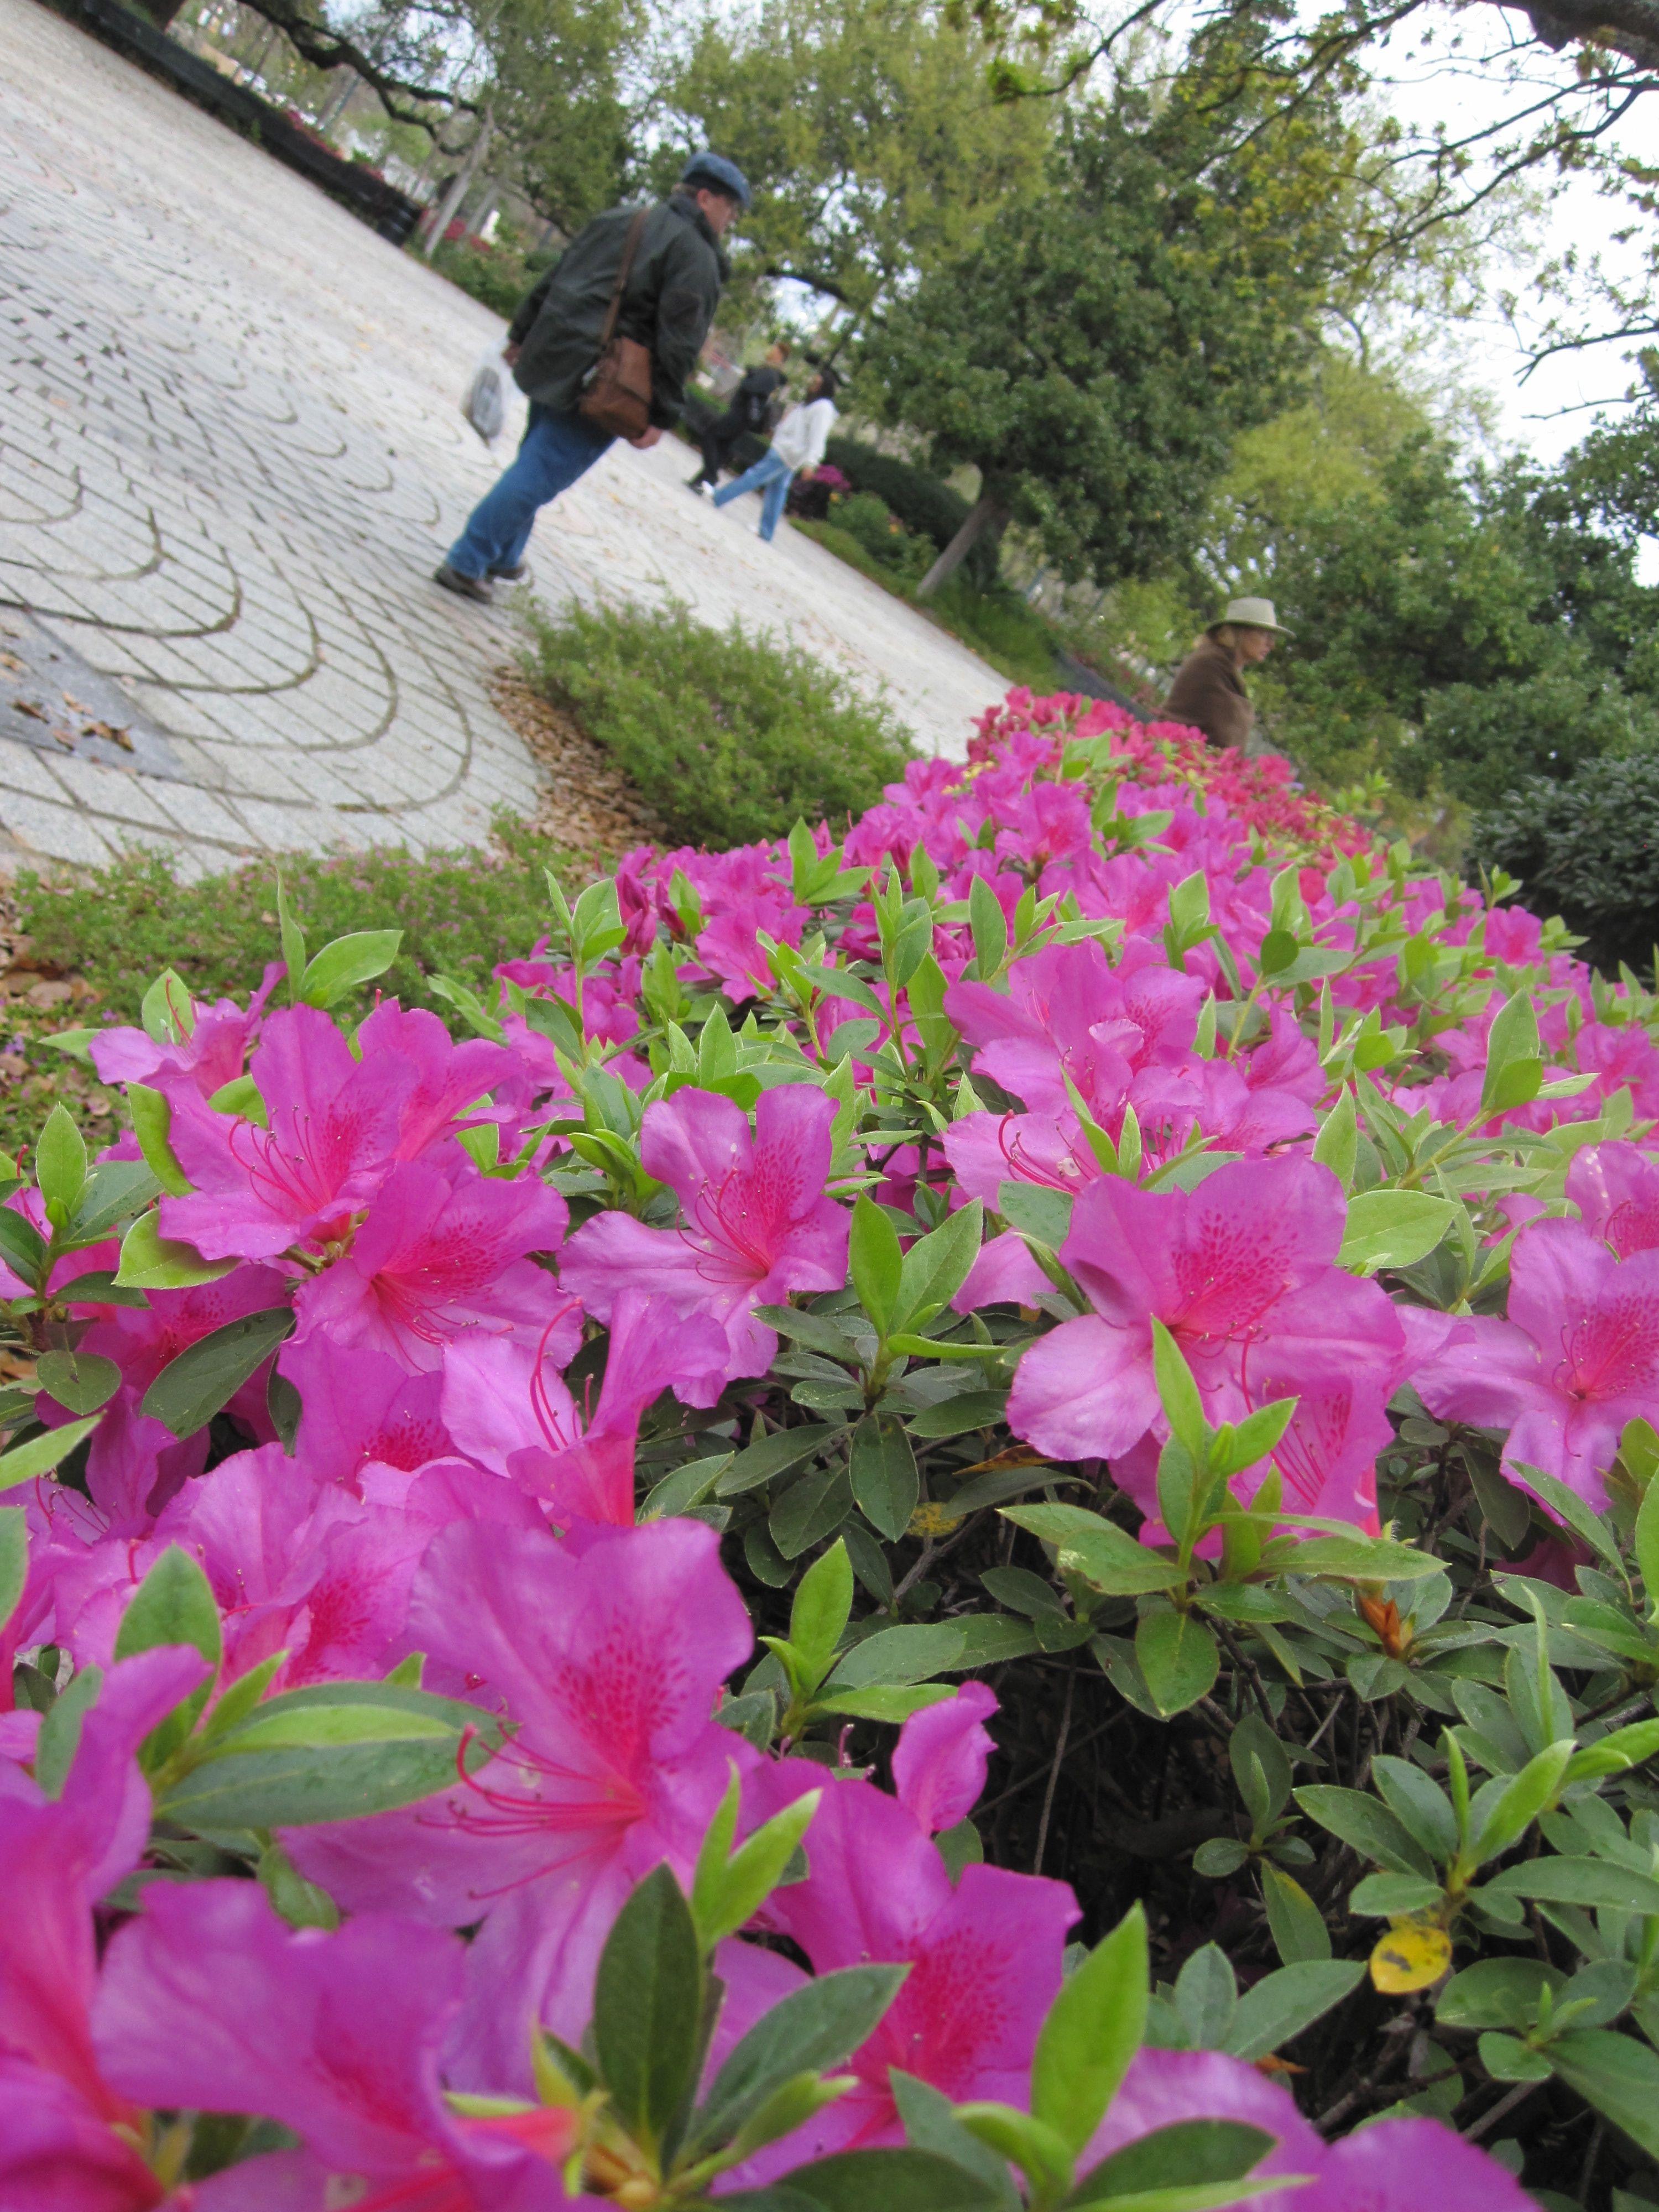 Congo Square Azalea in Bloom, New Orleans Azaleas, New